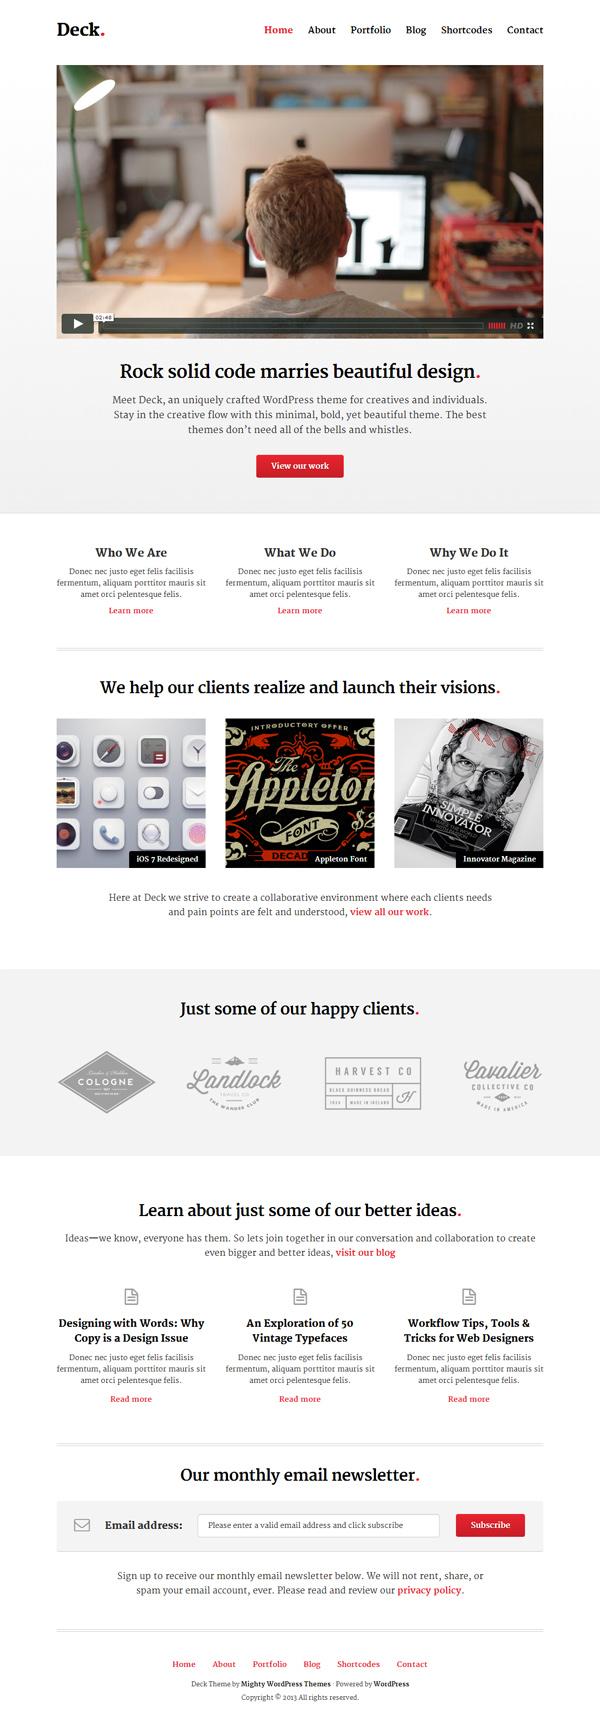 Deck WordPress Theme